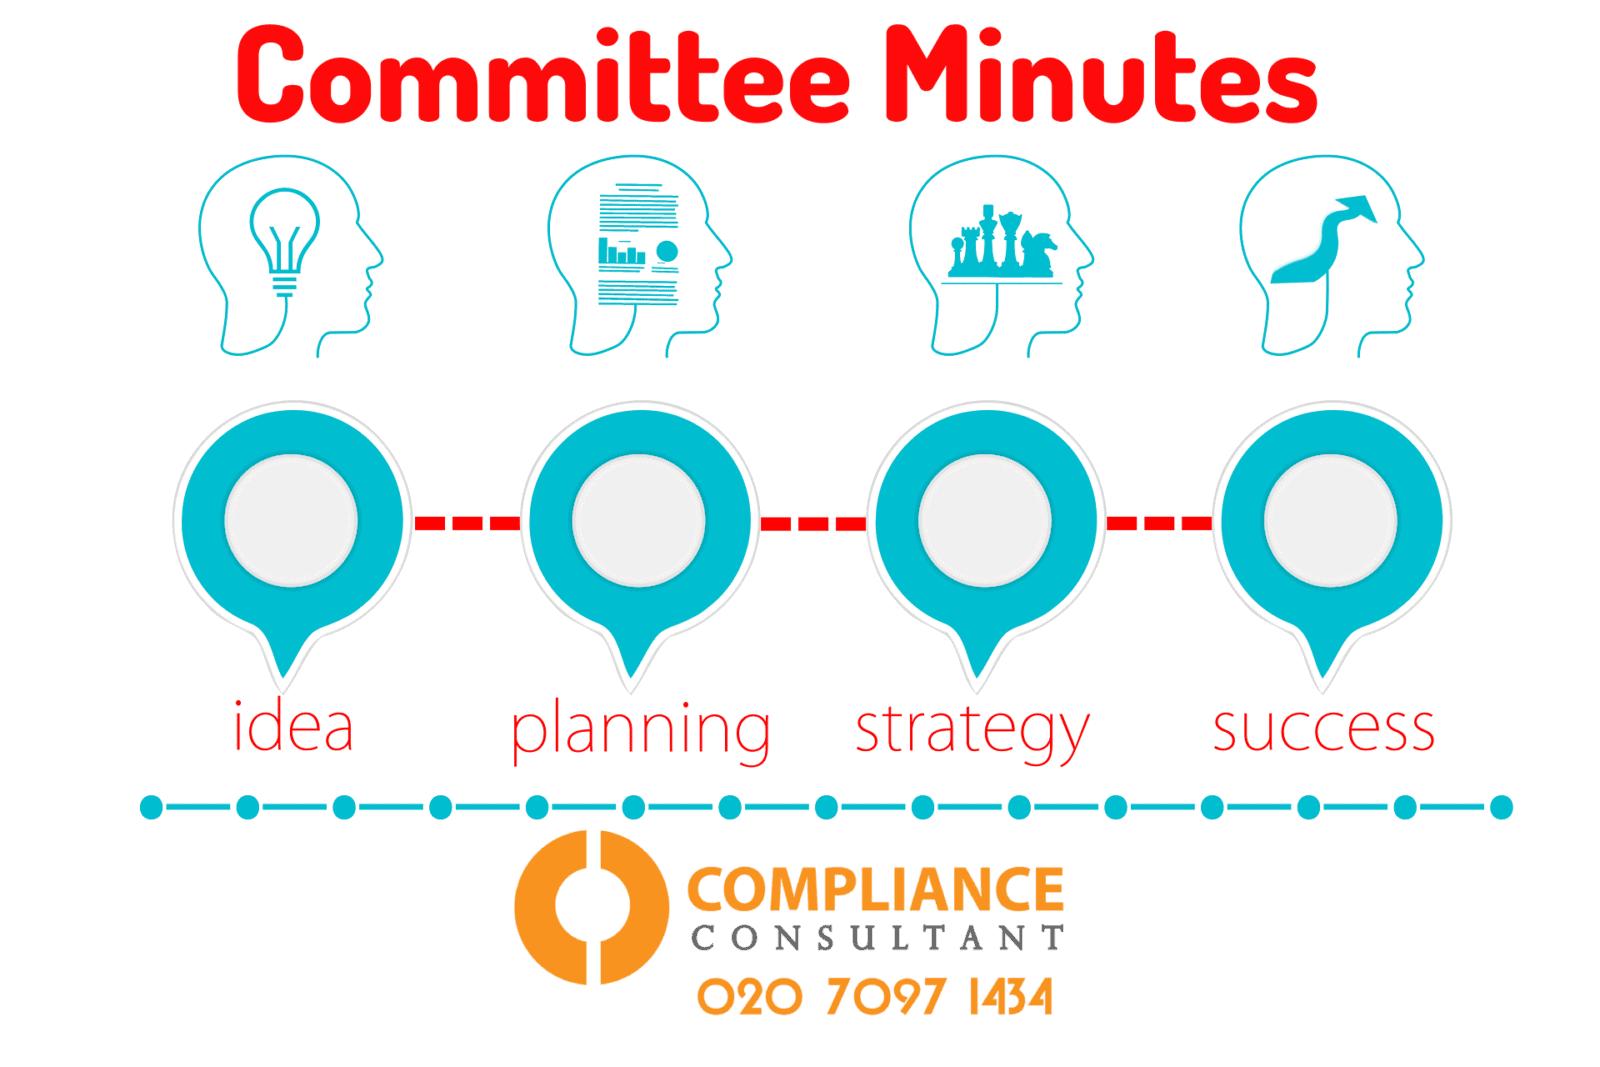 compliance consultant-compliance consultants-fca compliance consultants-committee minutes